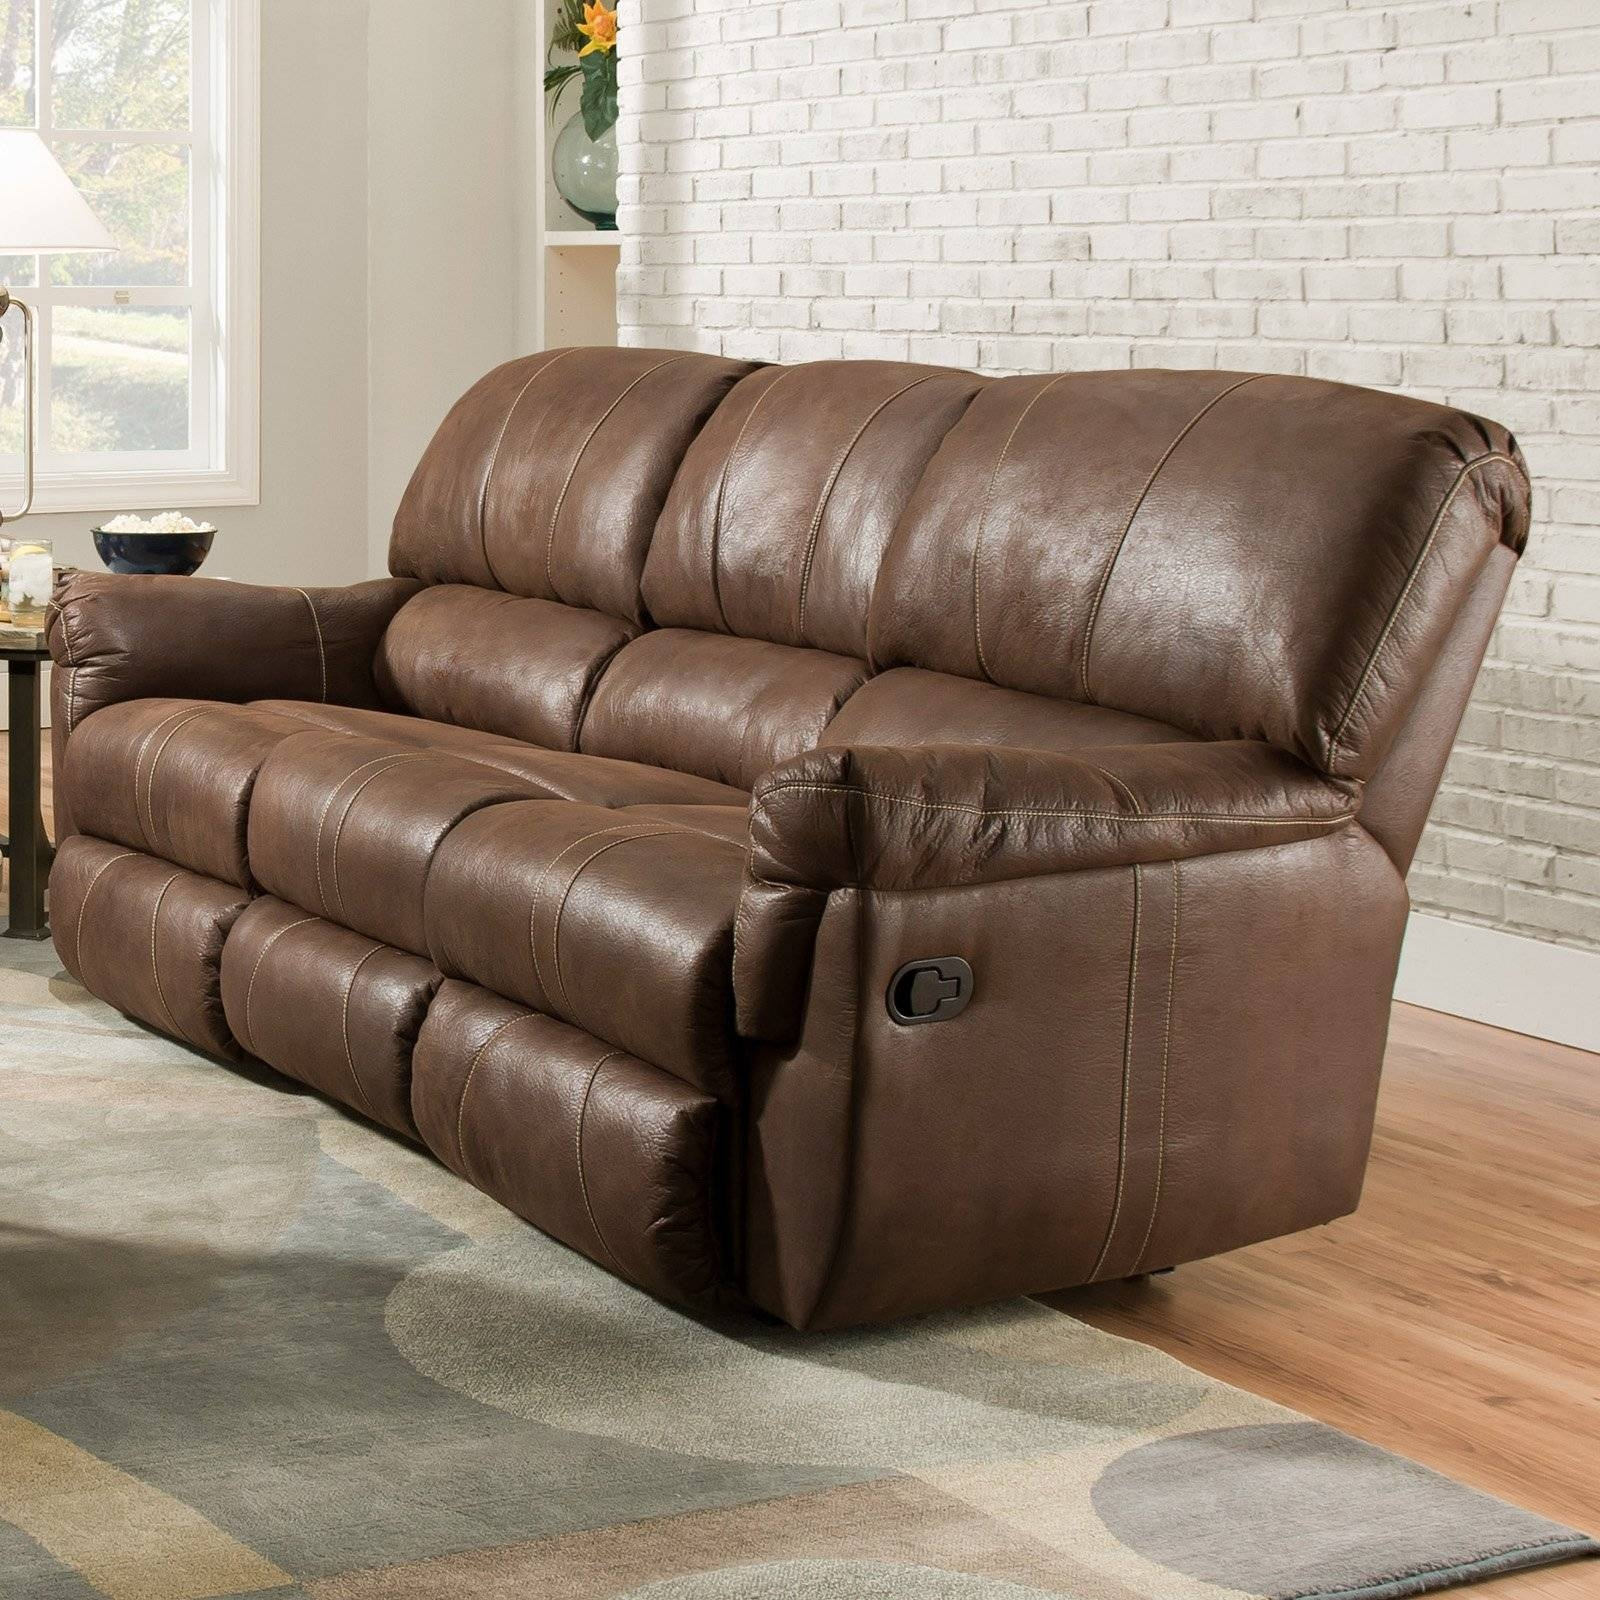 Simmons Upholstery Renegade Beautyrest Sofa - Mocha - Walmart inside Simmons Leather Sofas (Image 14 of 15)